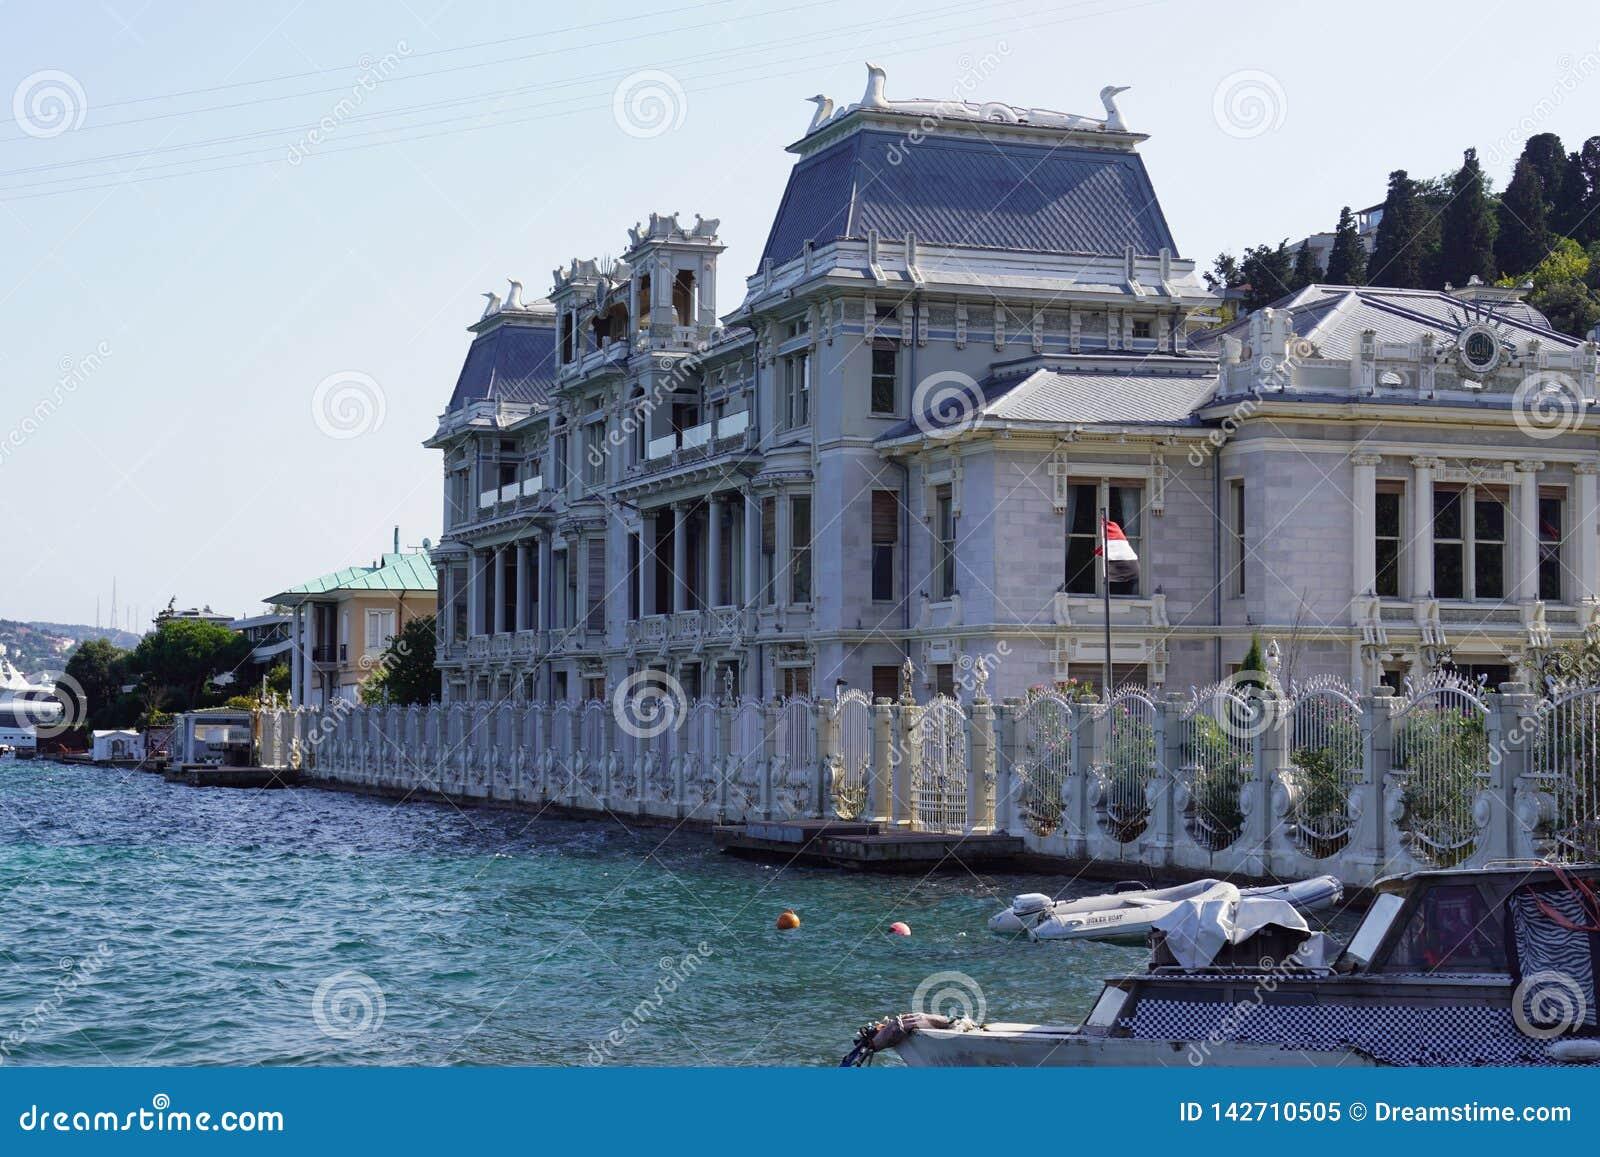 Ä°stanbul, Marmara/Turquia 10 03 2019: Consulado de Egito